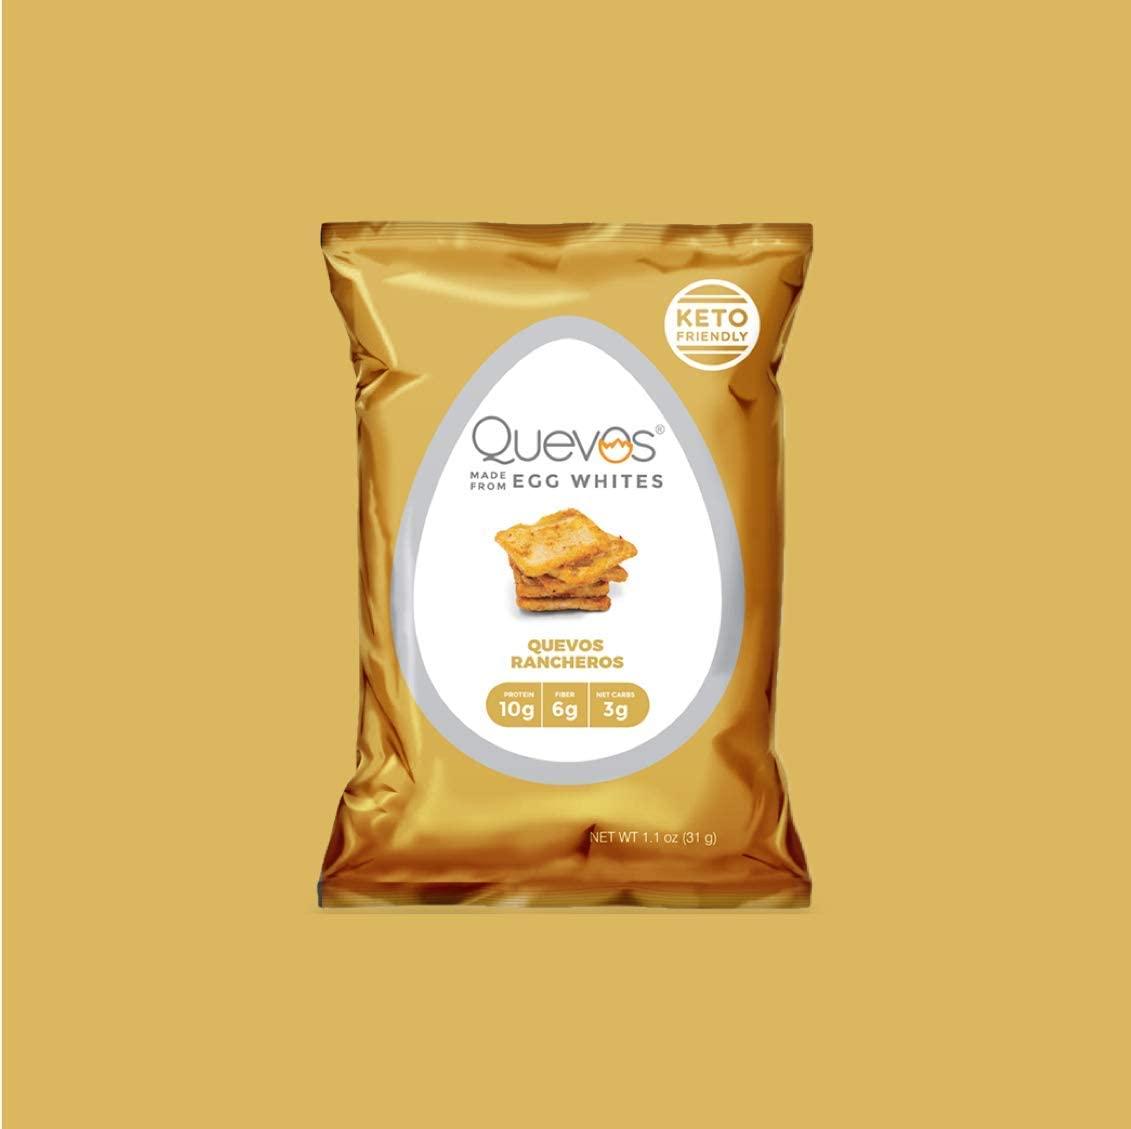 Quevos Keto Friendly Egg White Chips + Protein & Fiber - Gluten Free, Soy Free, Lactose Free - 12 Pack (1.1 oz Each Bag) (Quevos Rancheros)